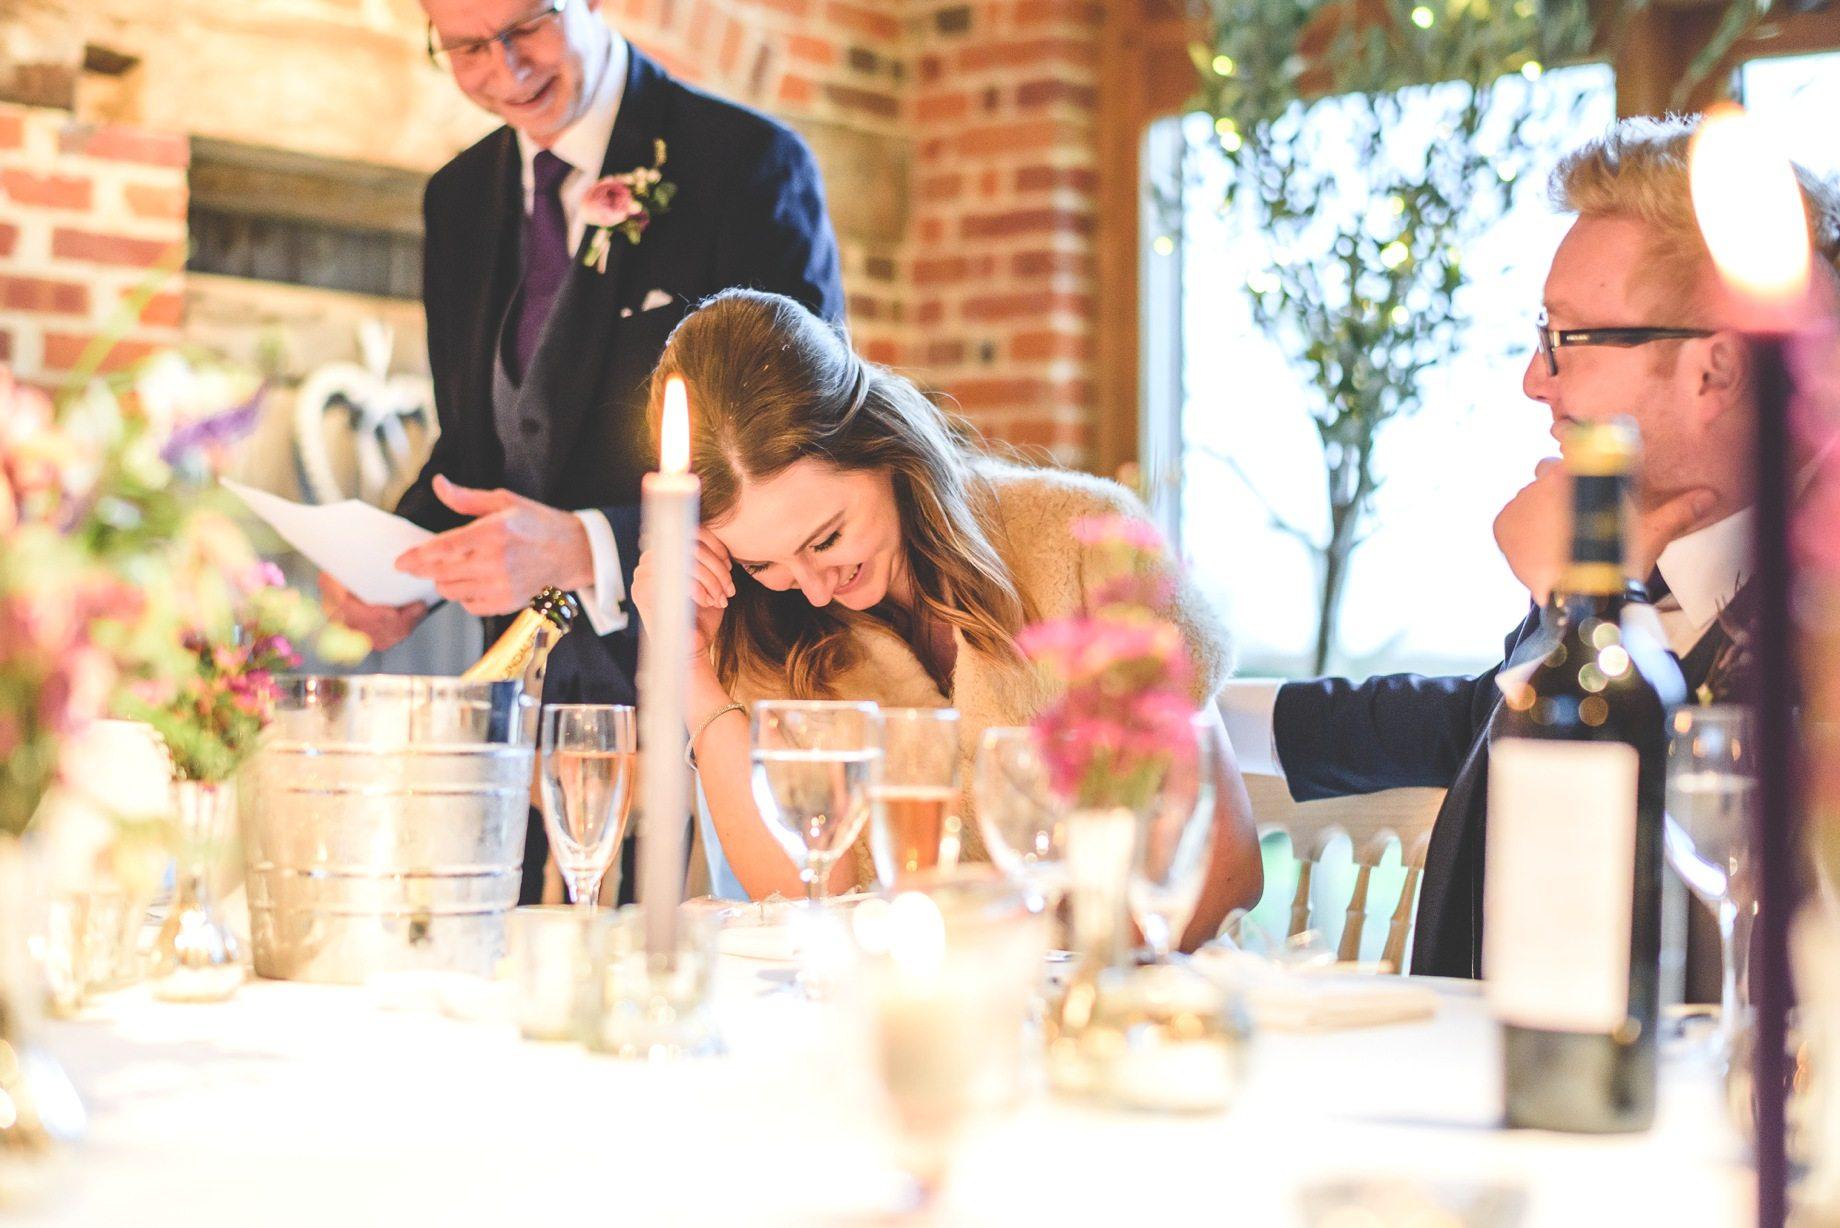 Heather-and-Chris-Hampshire-wedding-photography-141-of-174